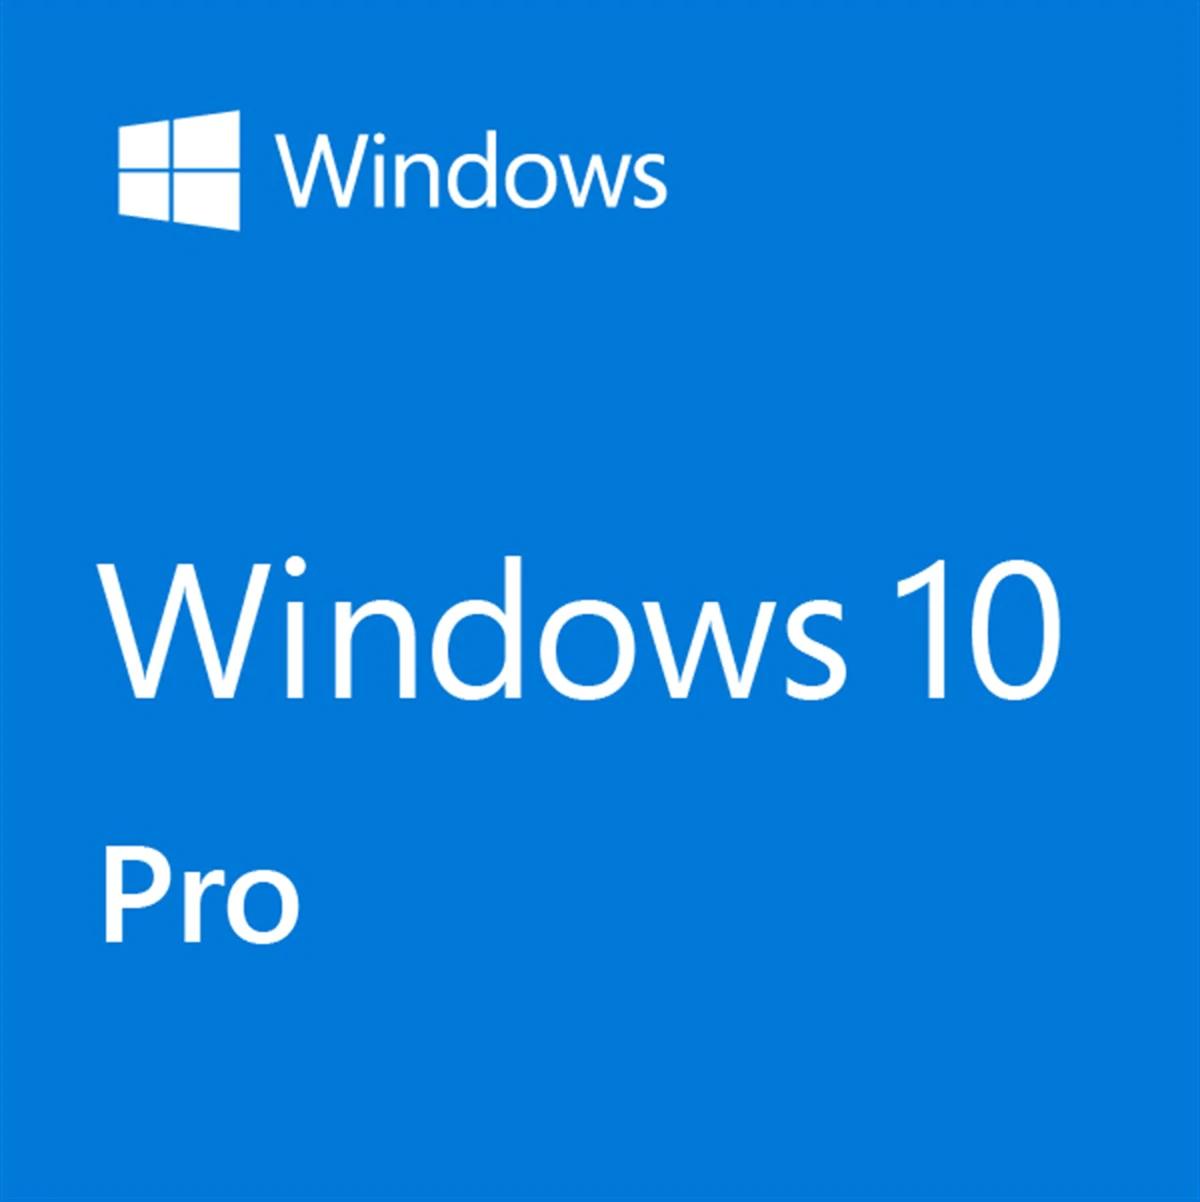 WINDOWS 10 PRO clave